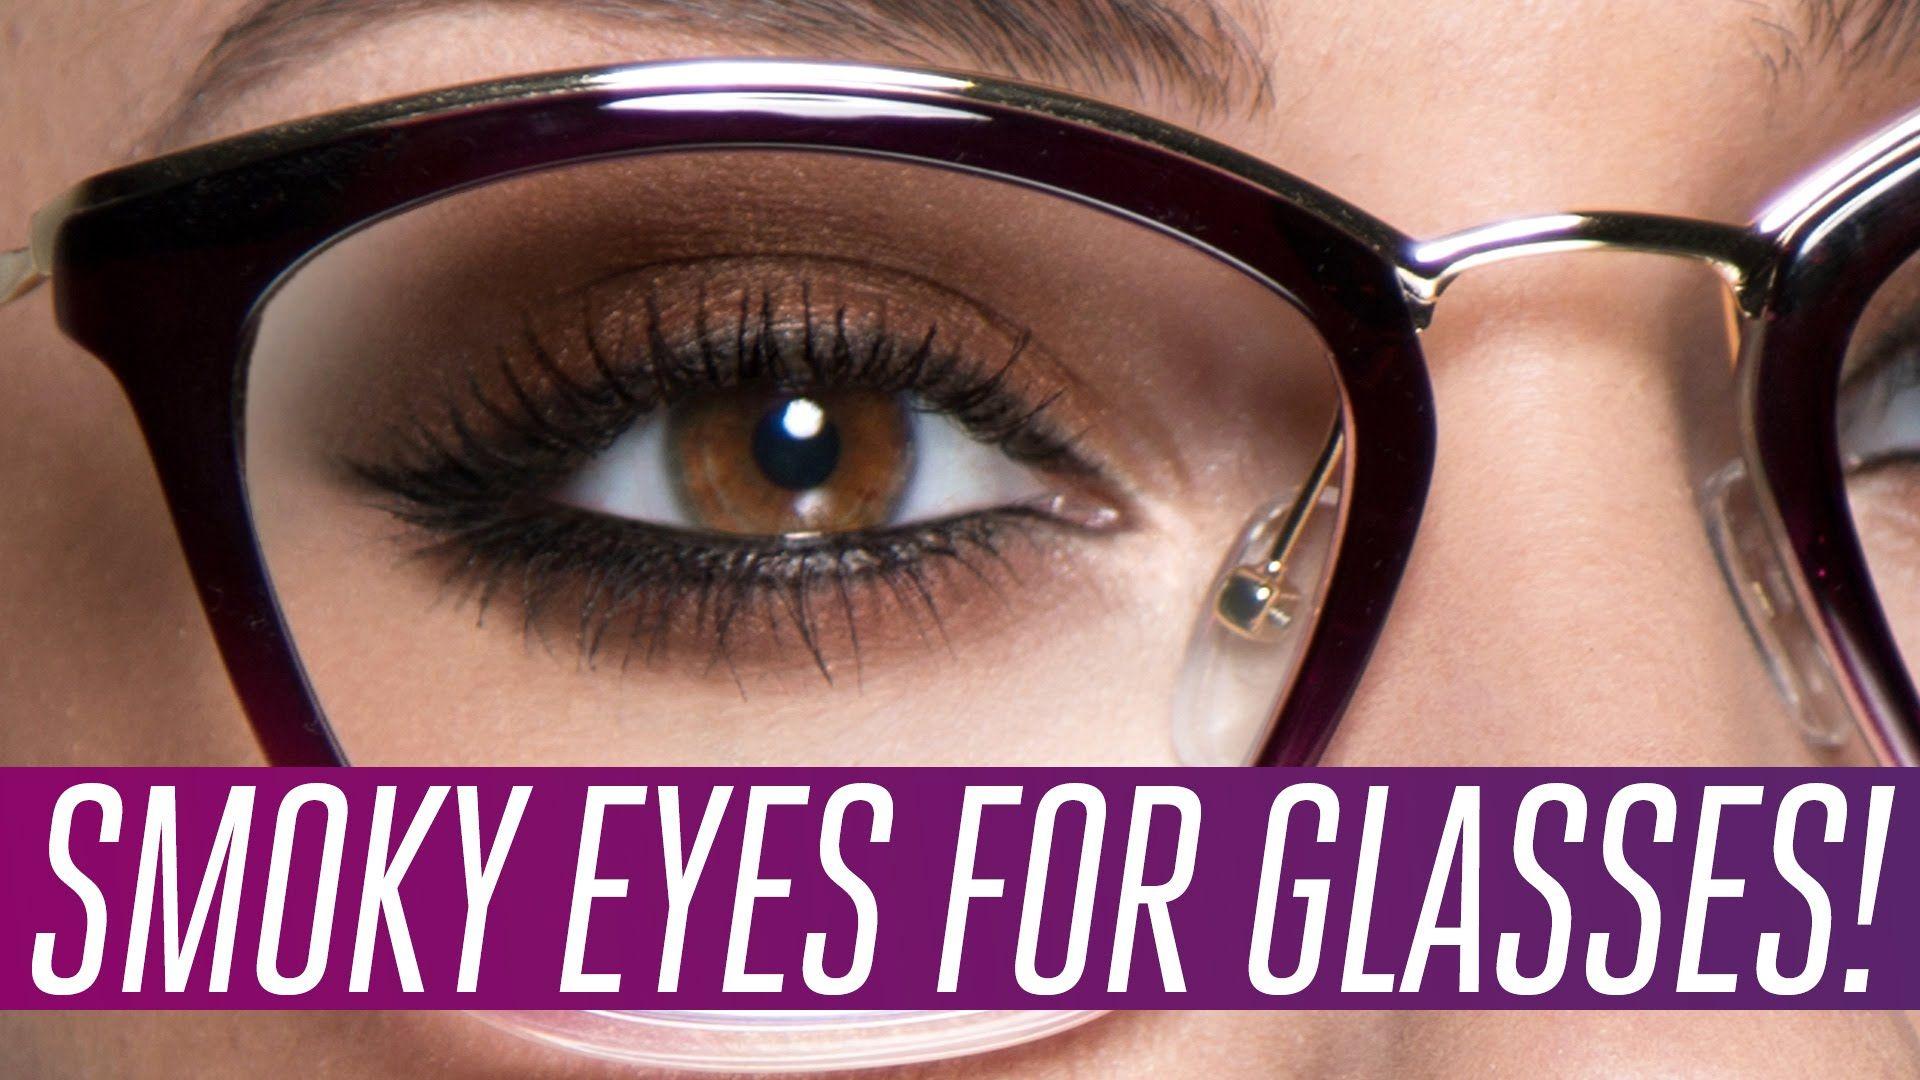 Smoky Eyes For Glasses Wearers Glasses Makeup Smoky Eye